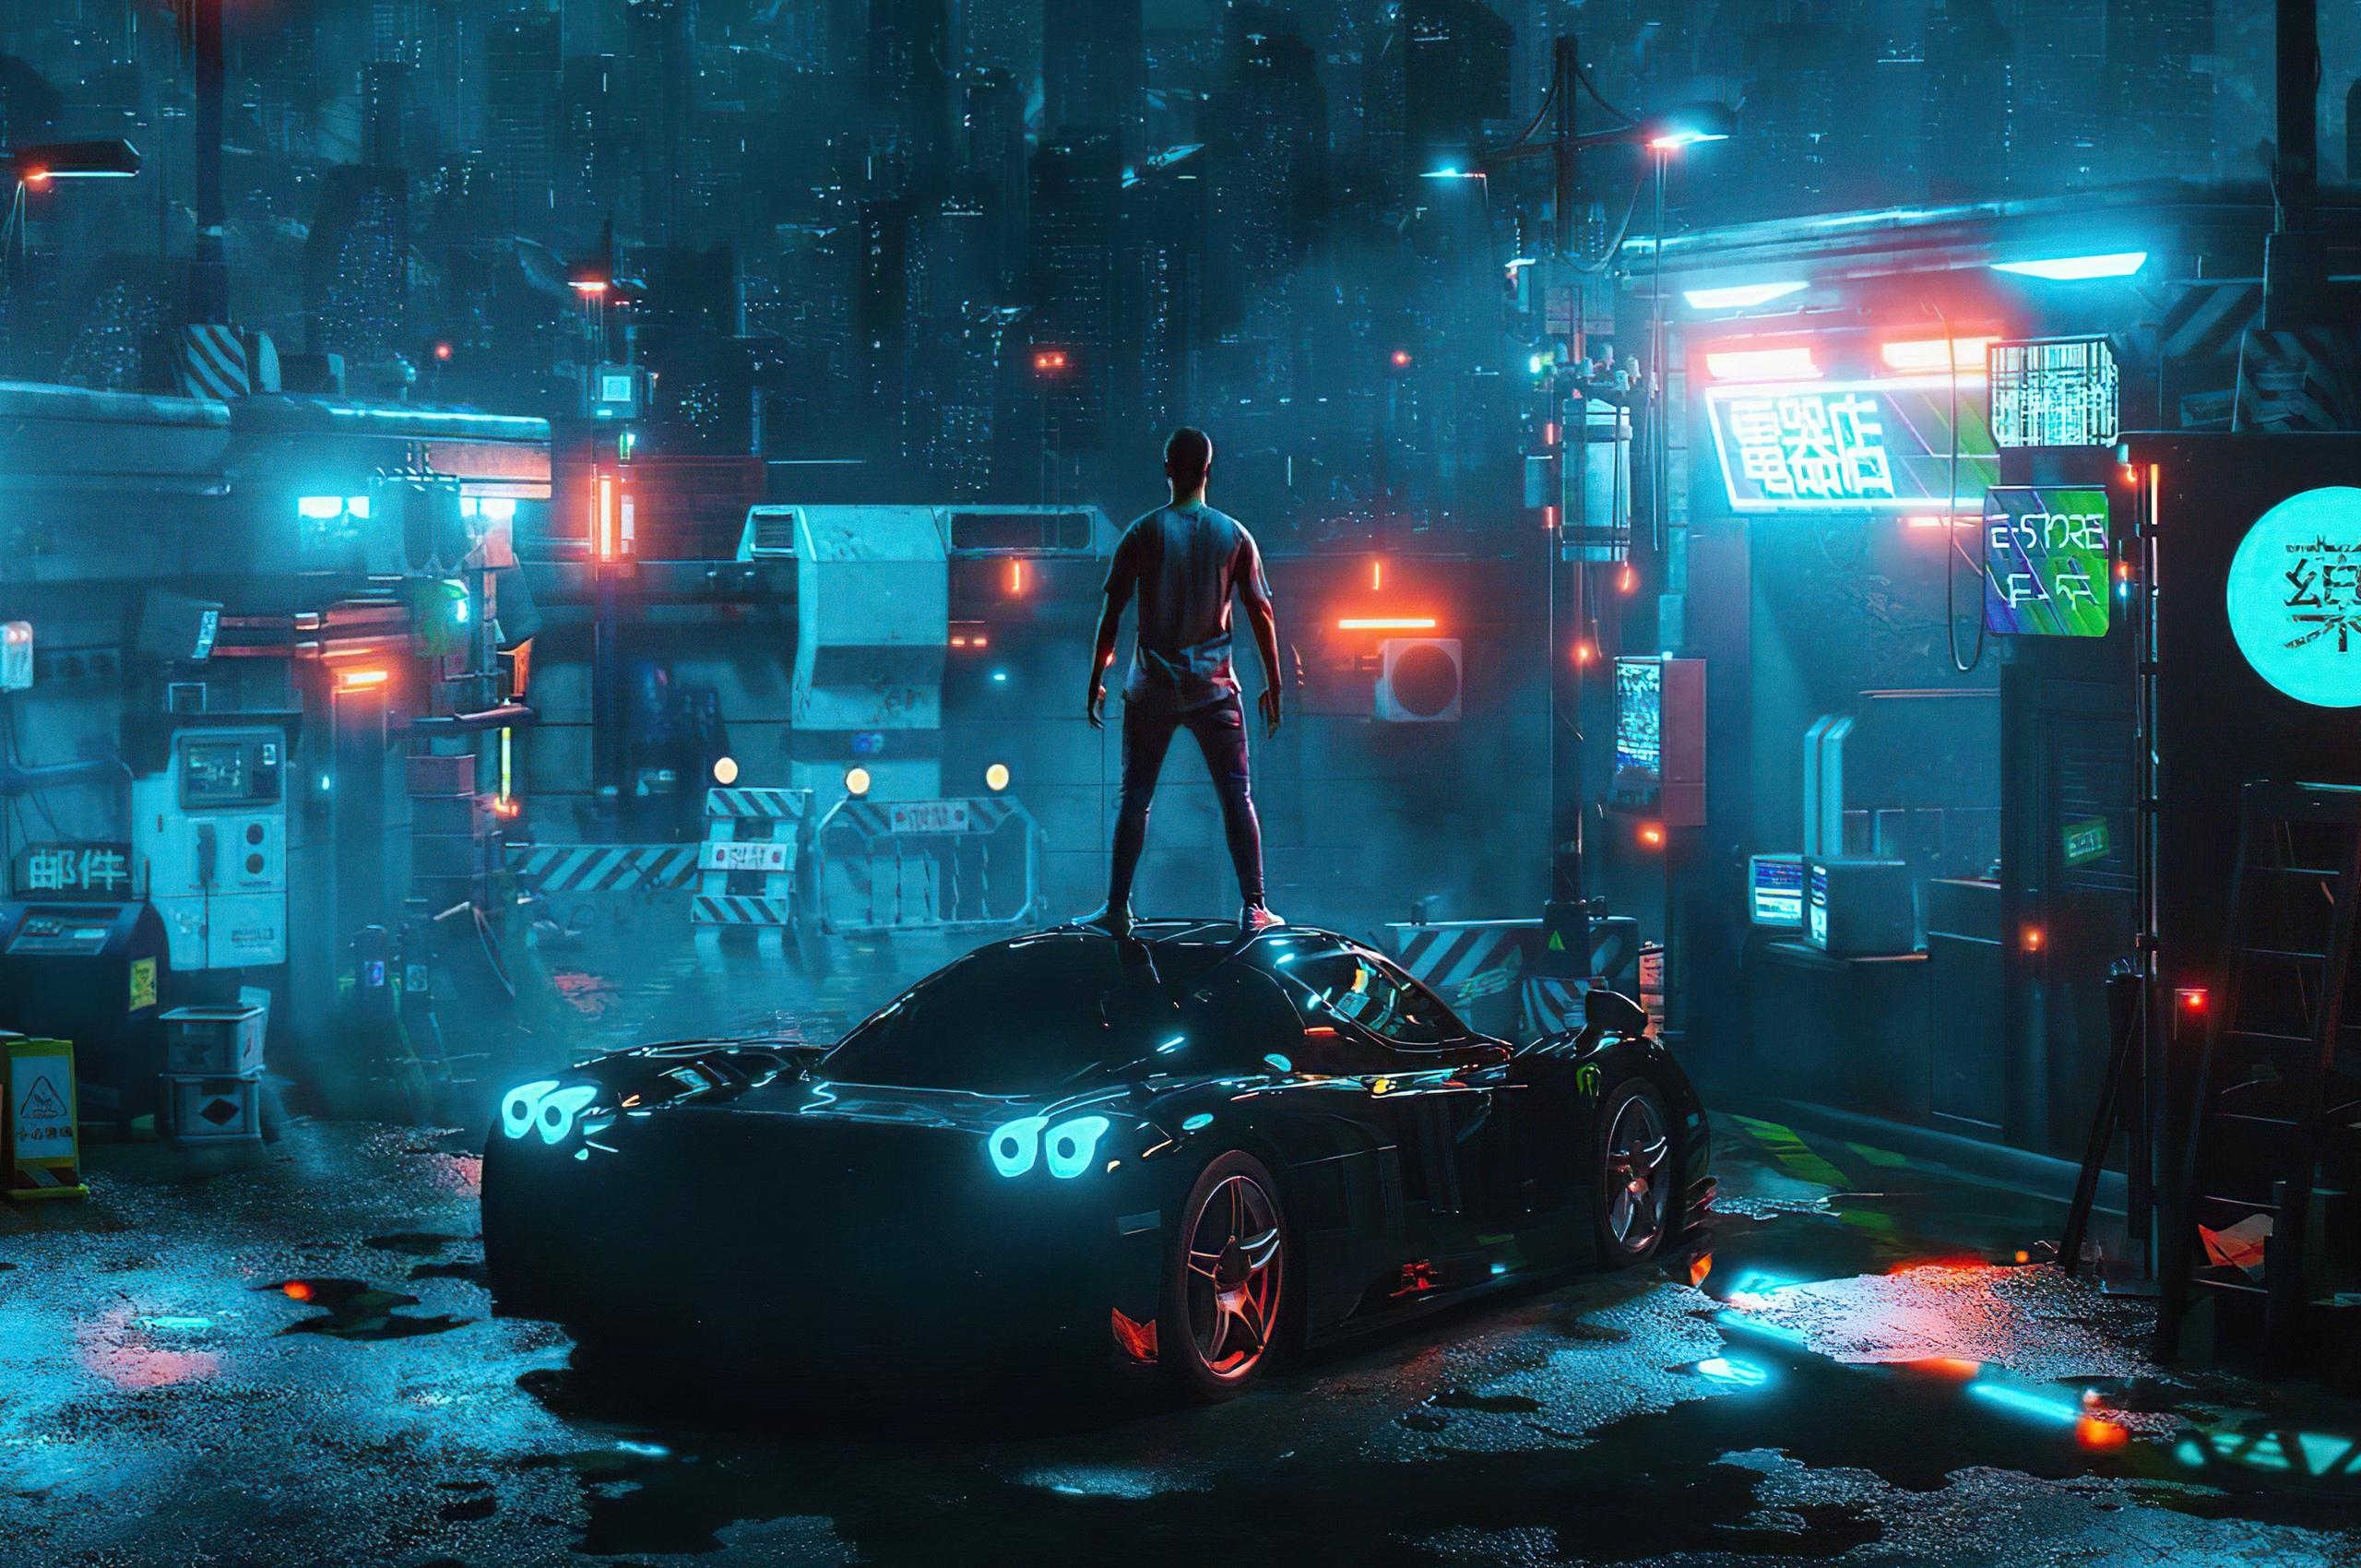 cyber-night-boy-standing-on-car-4k-yt.jpg